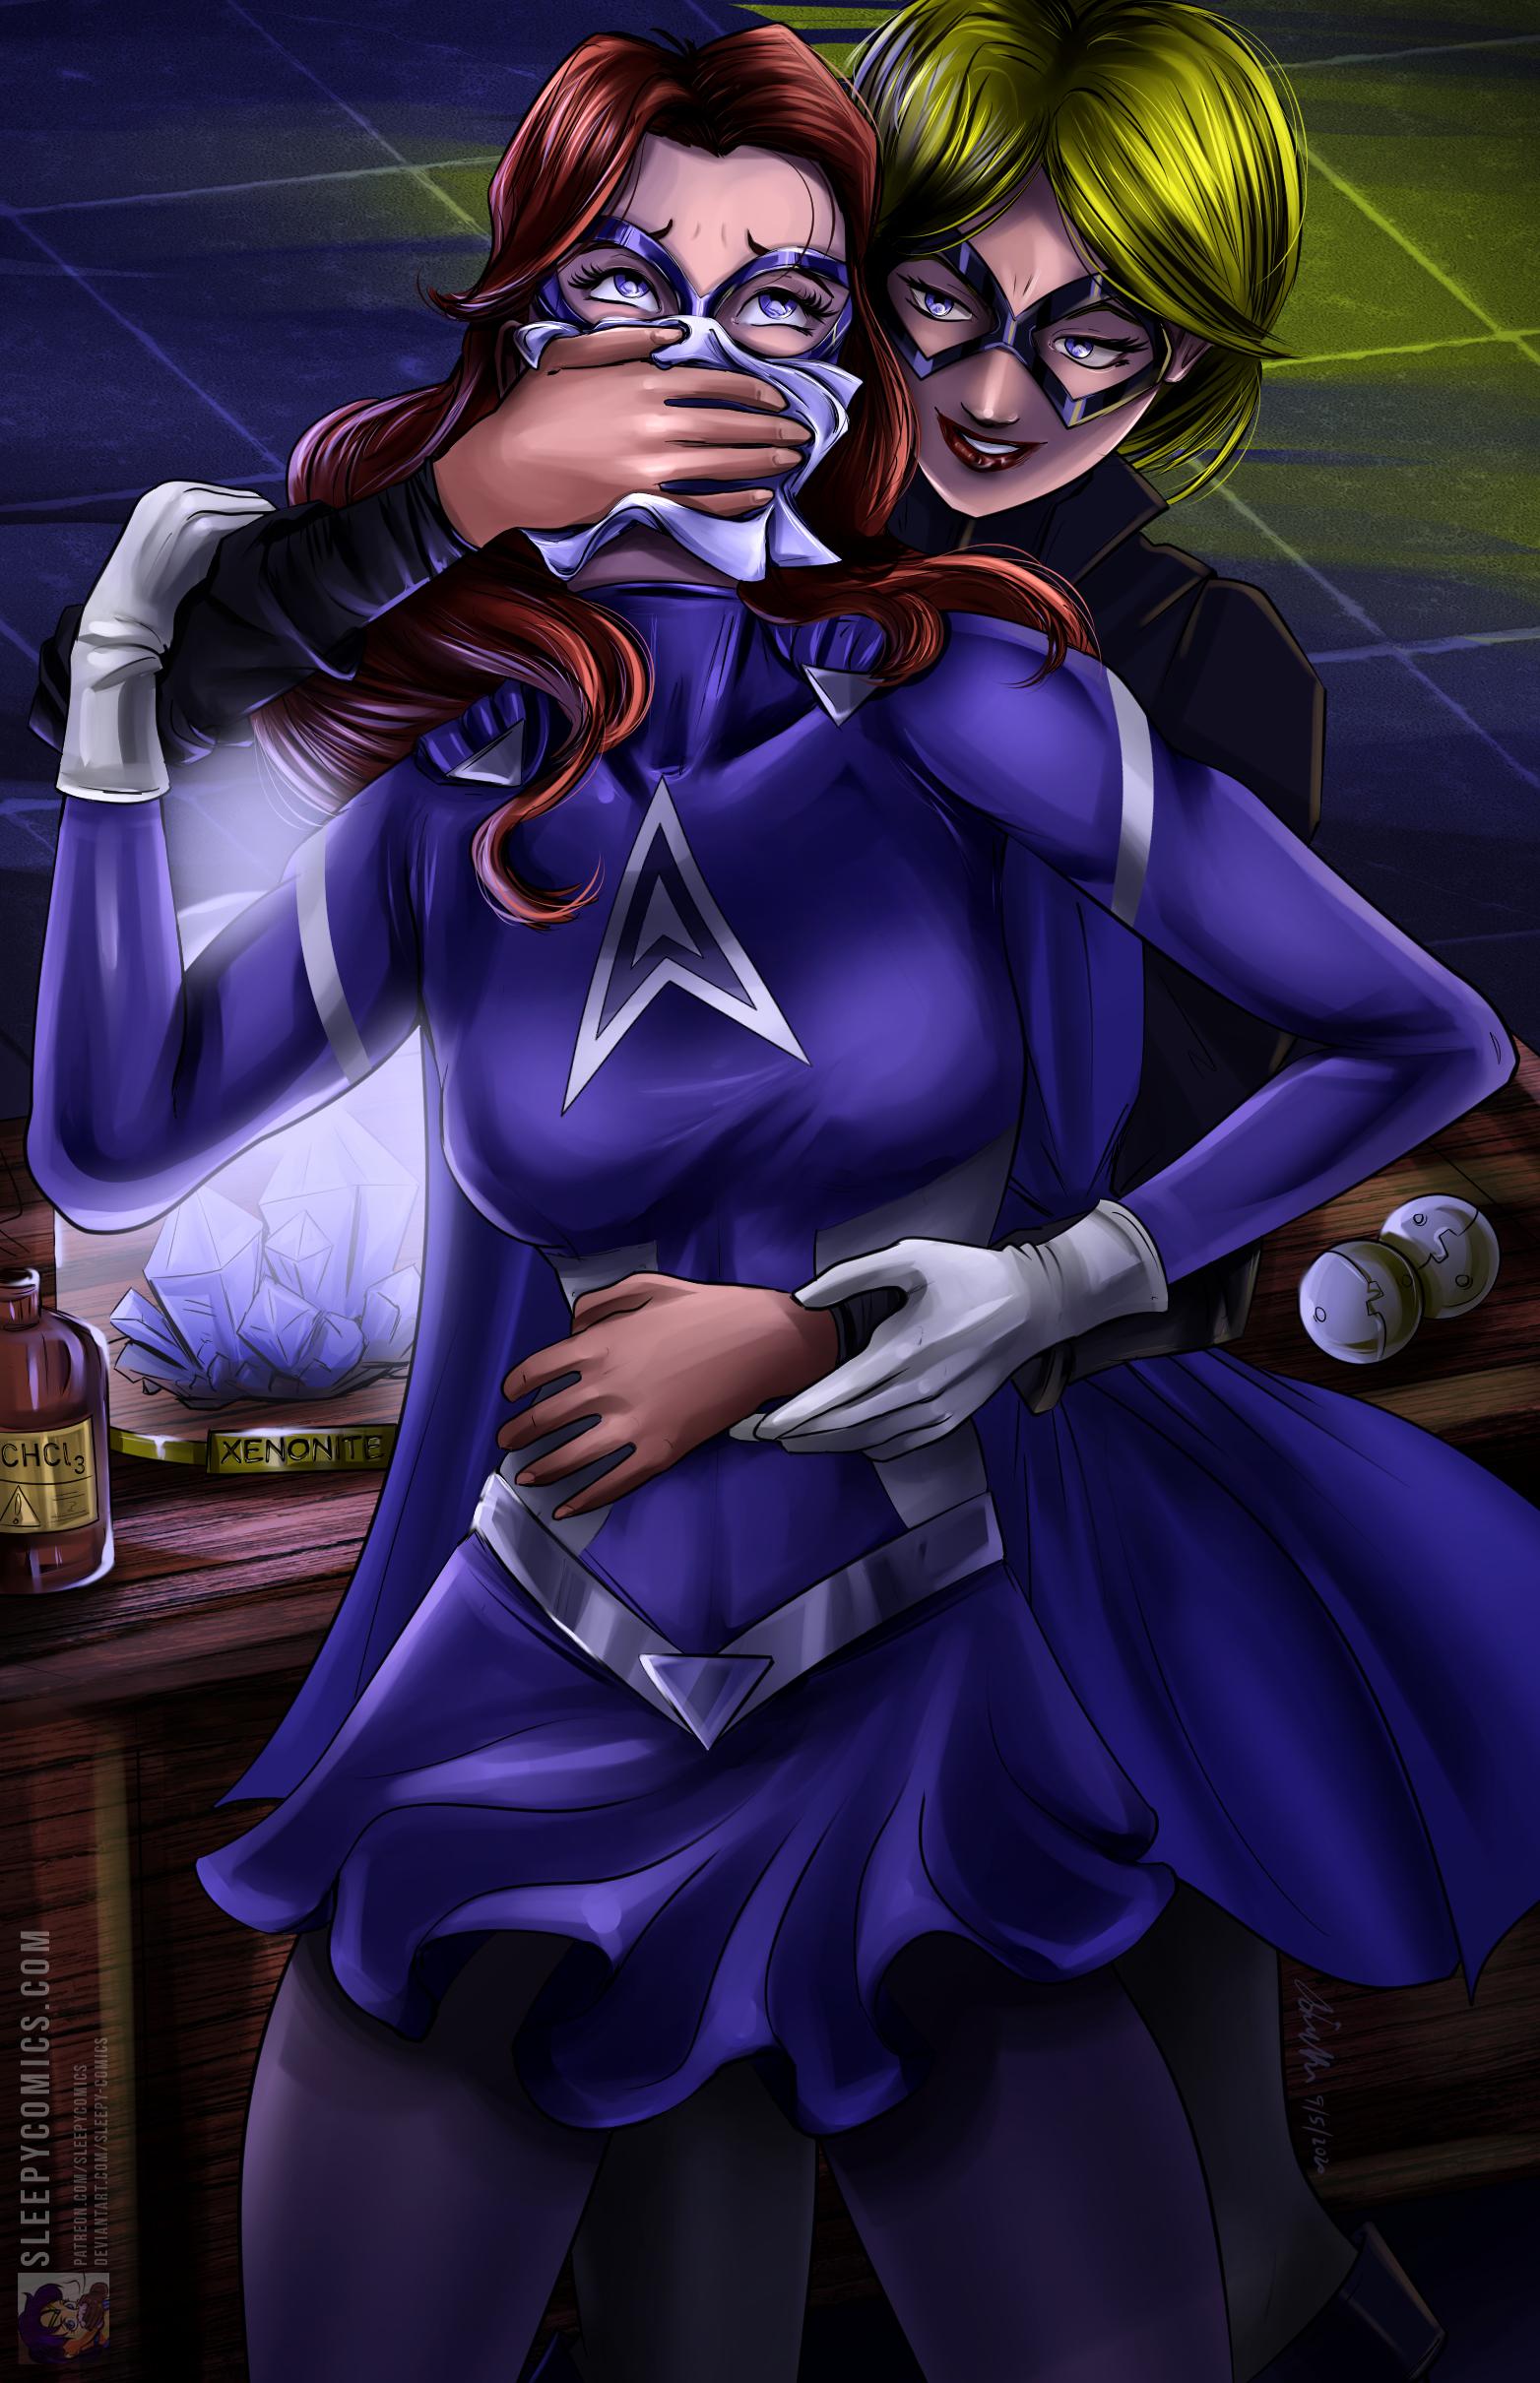 Astra Girl Chloroformed by Nyx